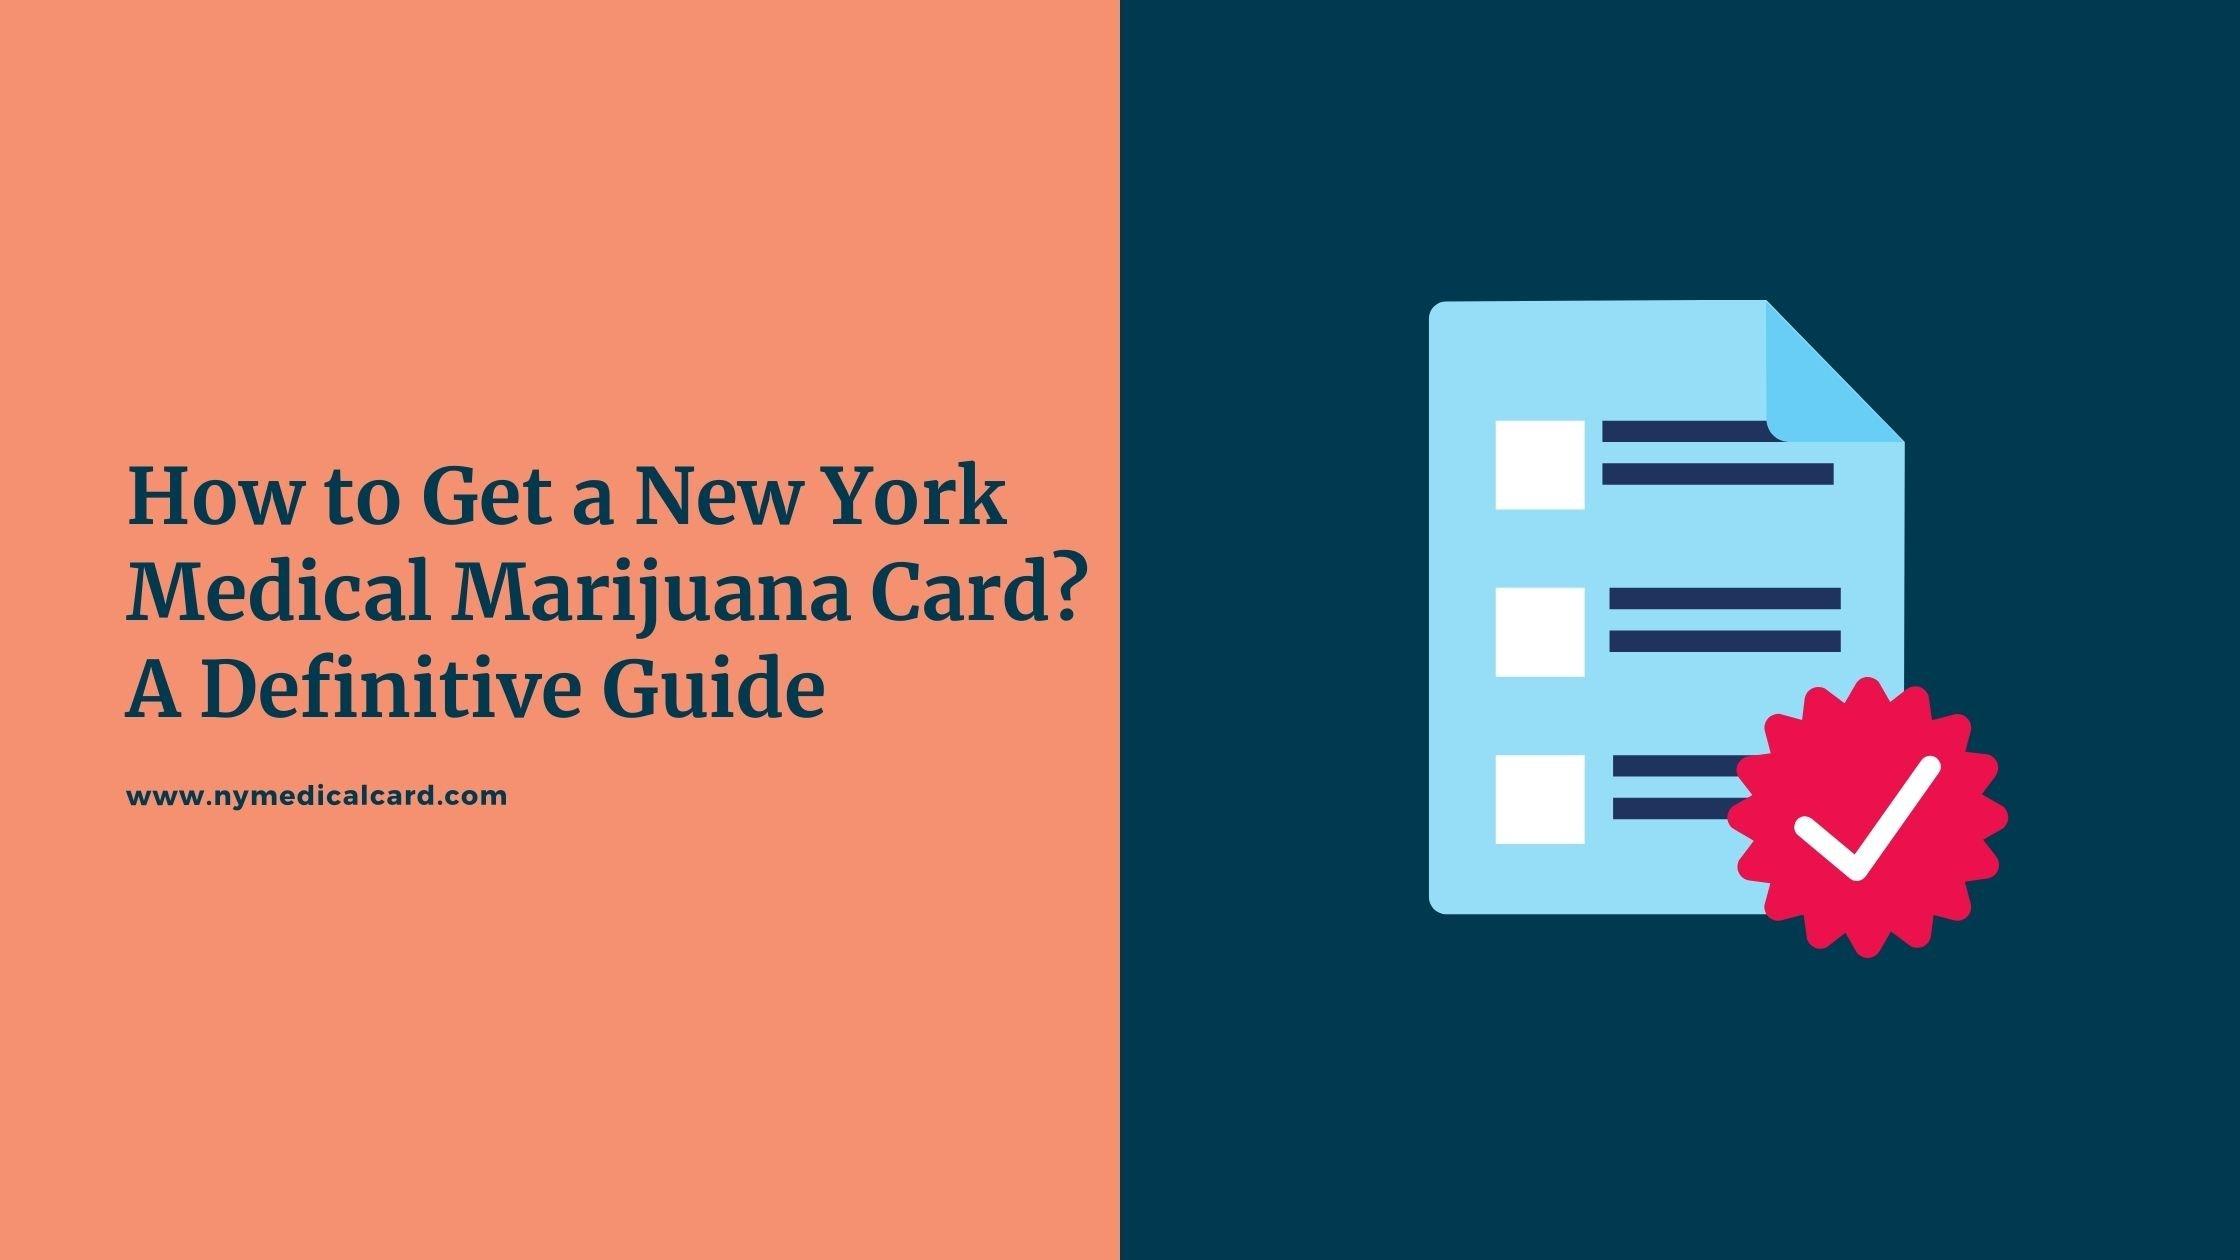 New York Medical Marijuana Card